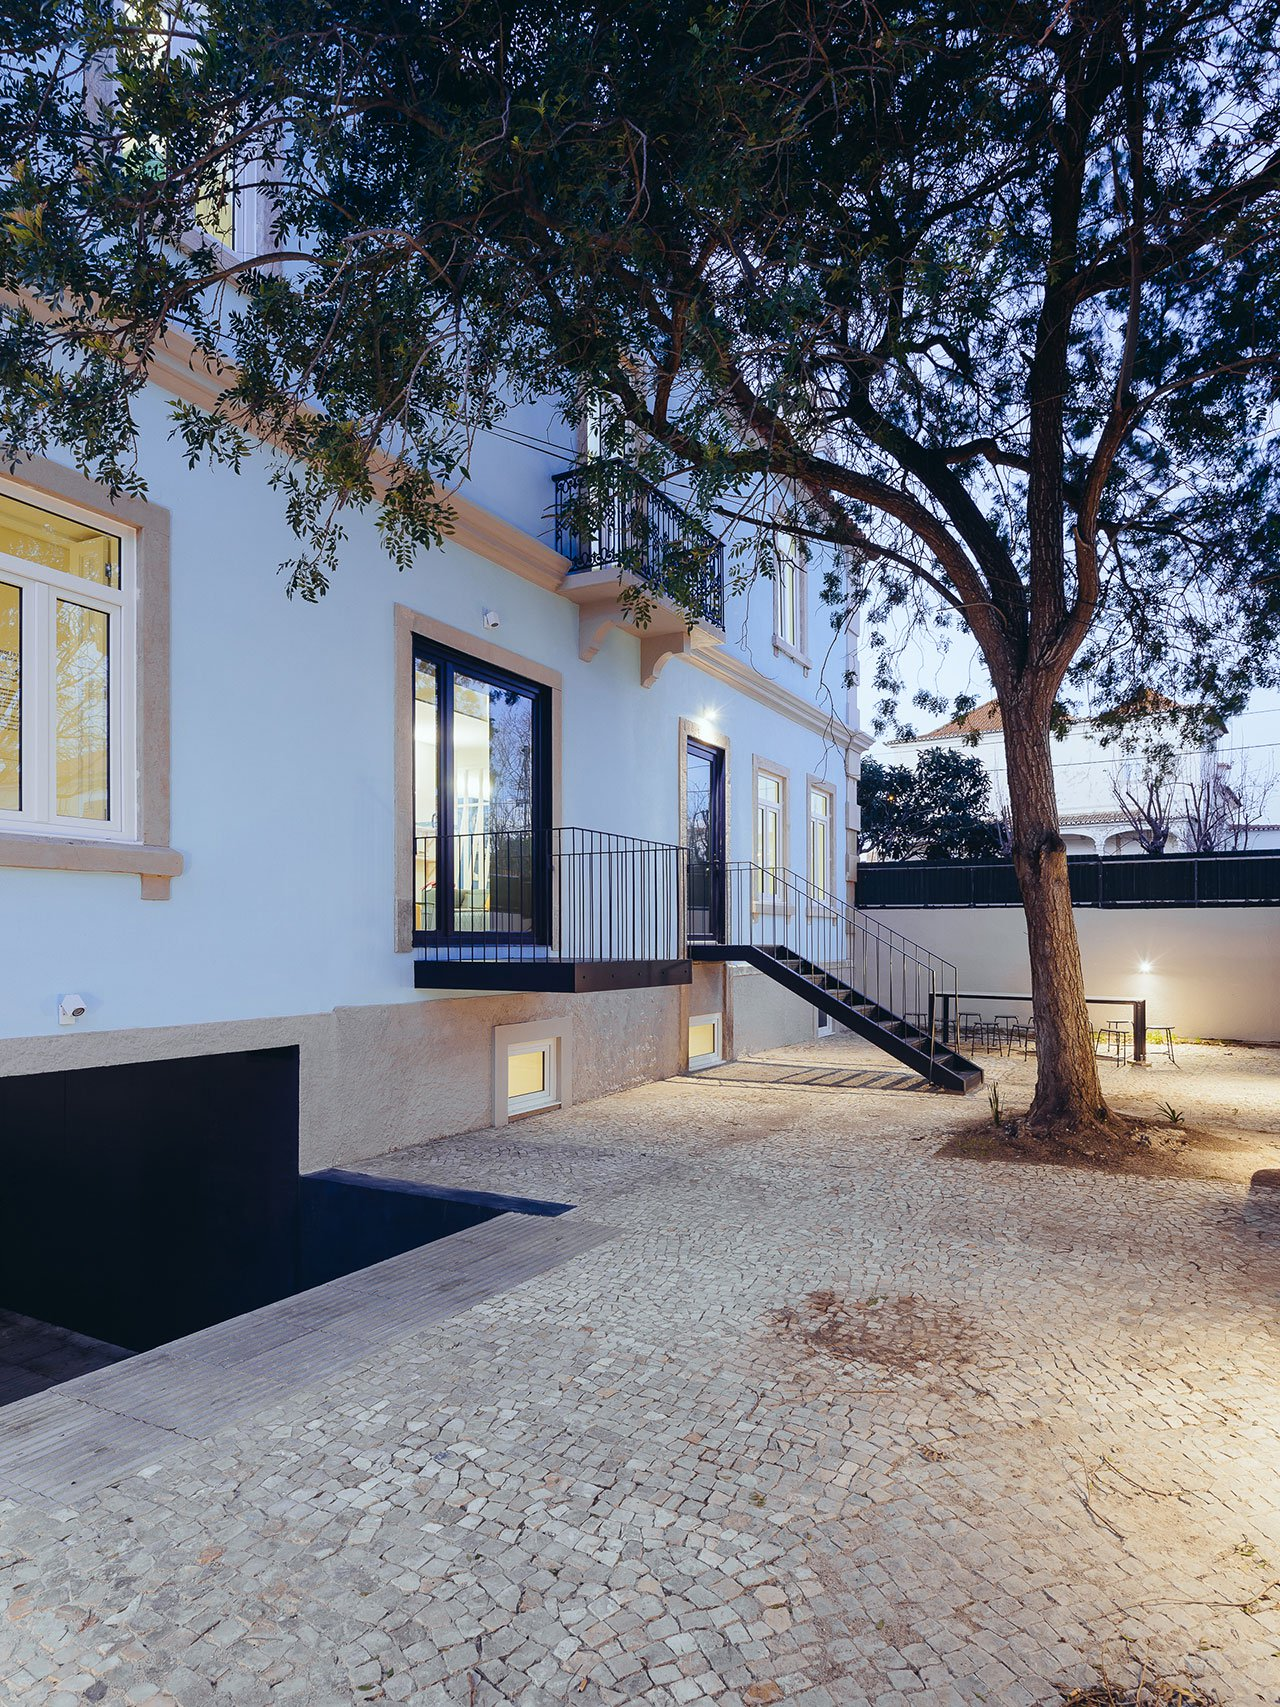 s21_hostel_in_parede_cascais_portugal_aurora_arquitectos_photo_do_mal_o_menos_yatzer.jpg